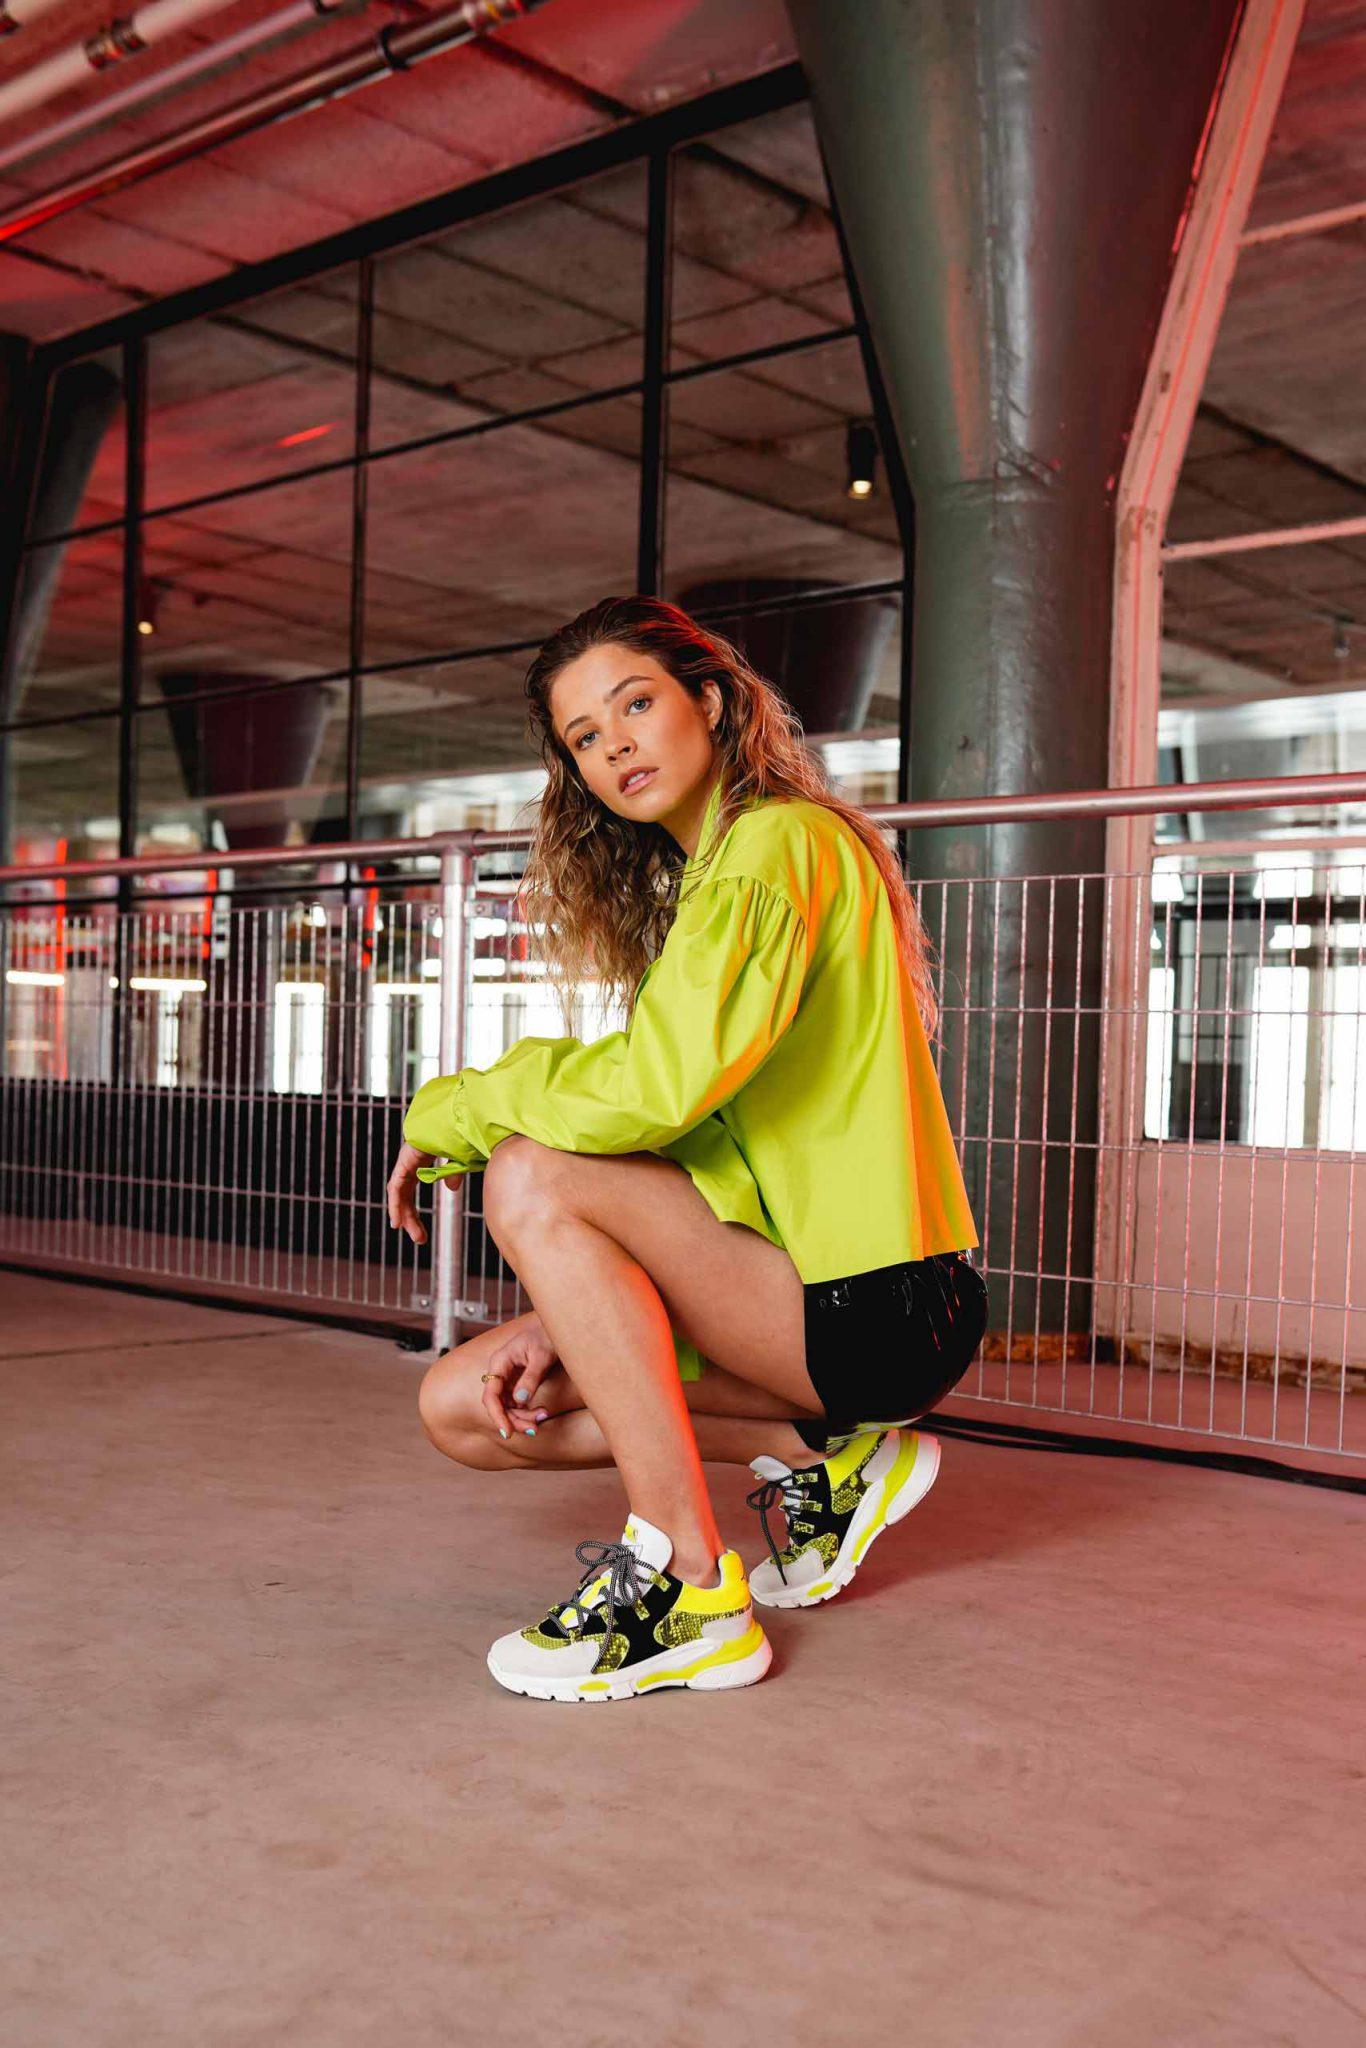 Ilsoo_van_Dijk_Ilsoovandijk_AFW_Toral_Backstage_Amsterdam_Fashion_week_2020_-scaled_